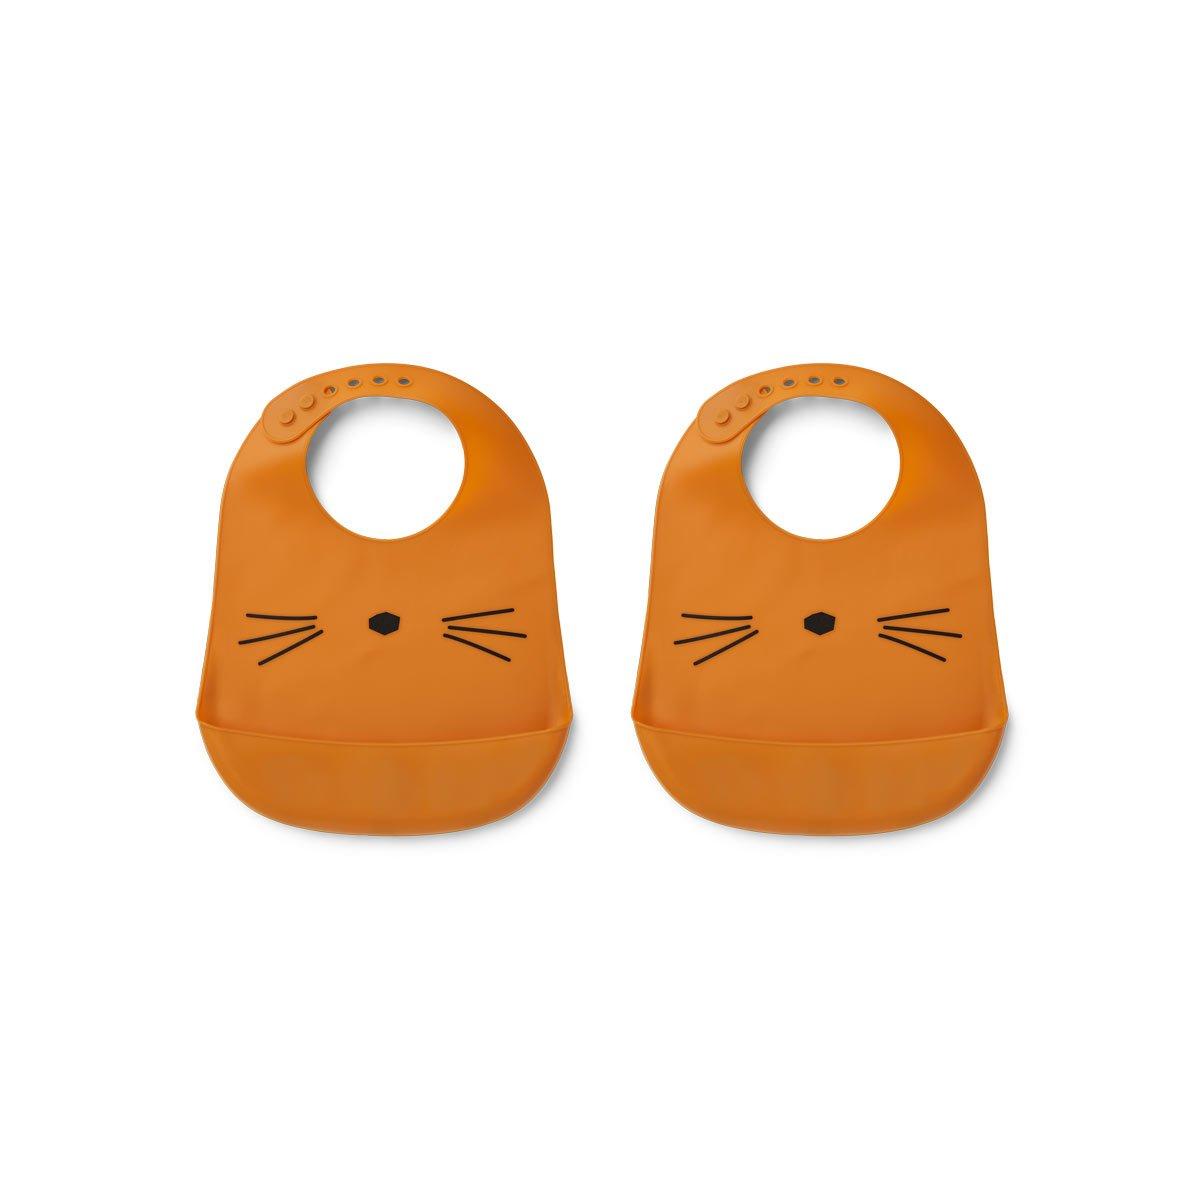 Tilda Silicone Bib 2 Pack - Cat mustard